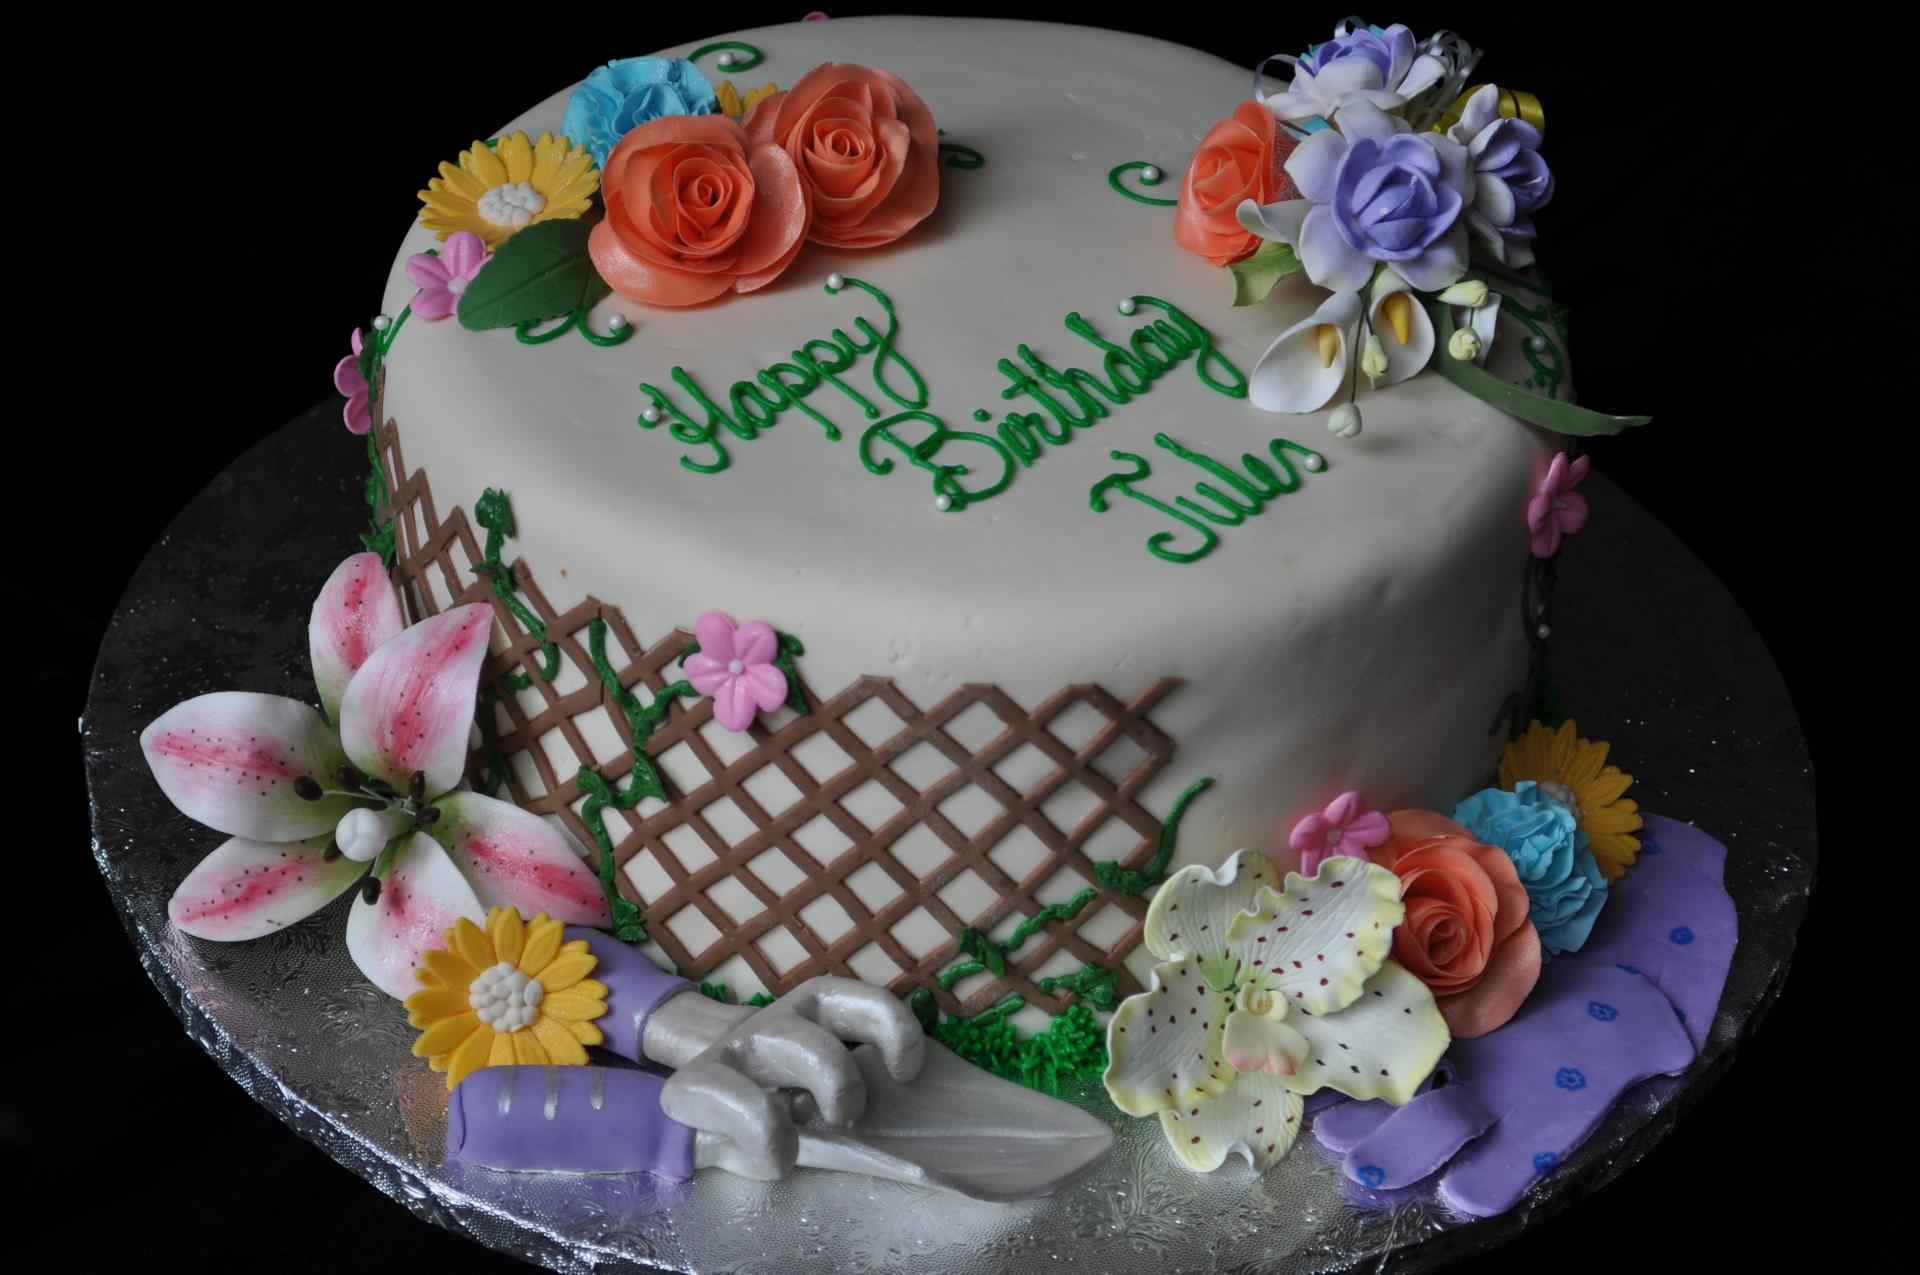 Assorted Sugar Flowers and lattice fondant cake